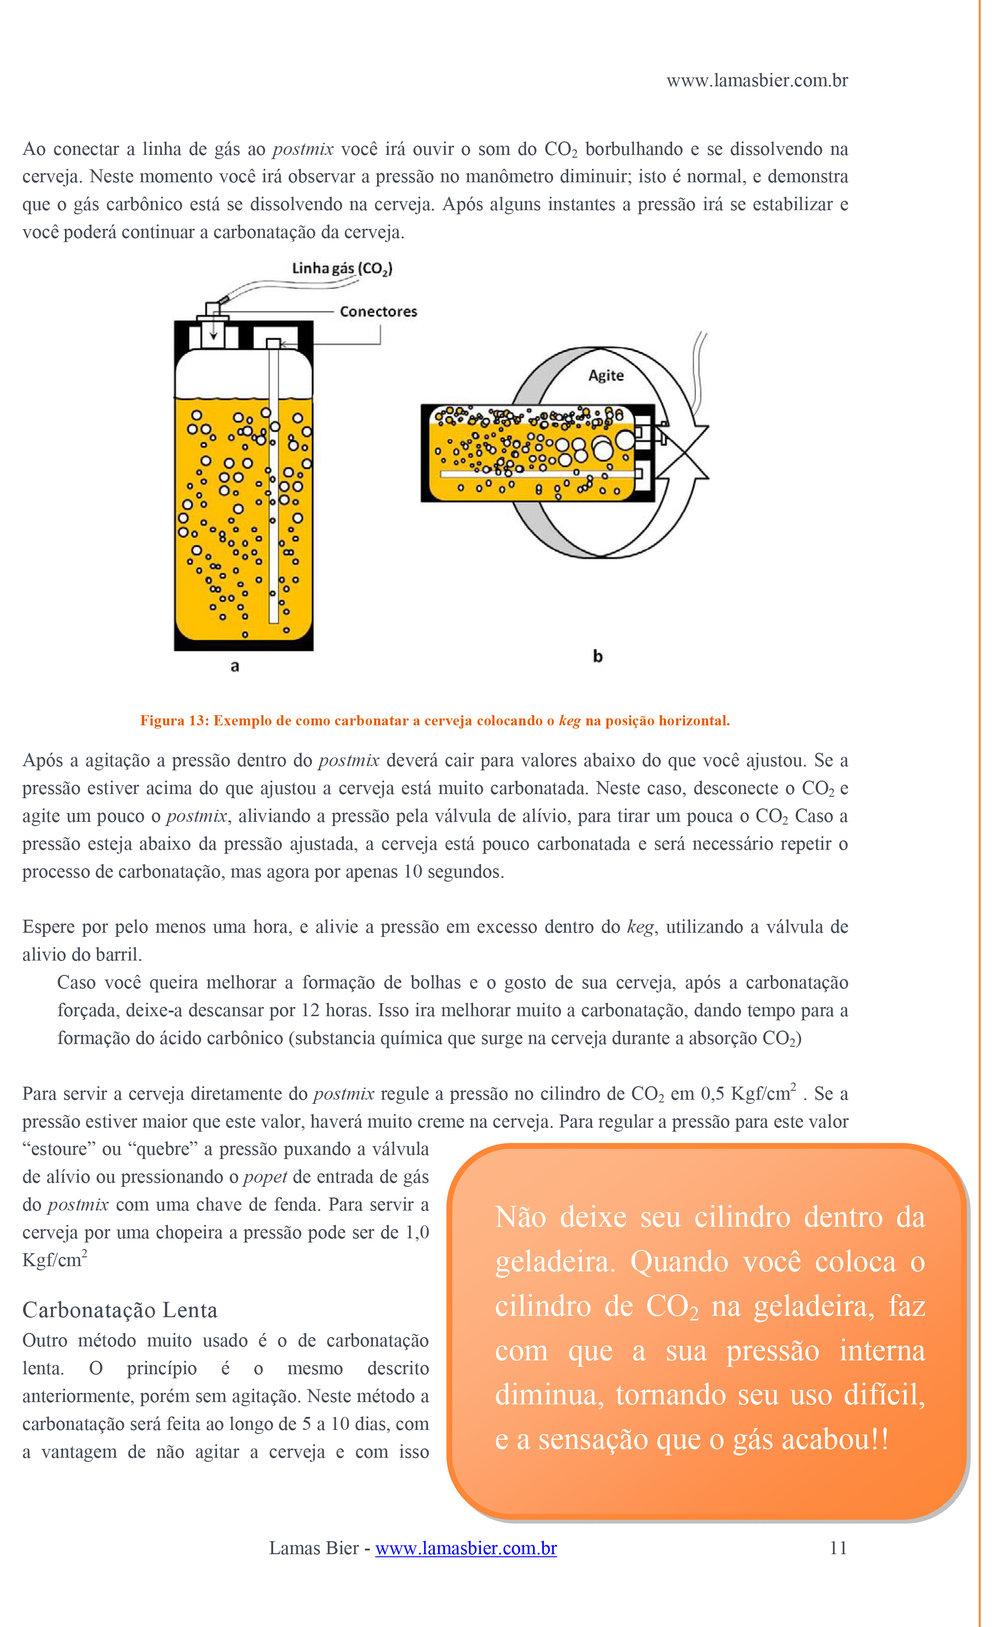 Microsoft Word - Manual de uso keg 1.1.1.docx